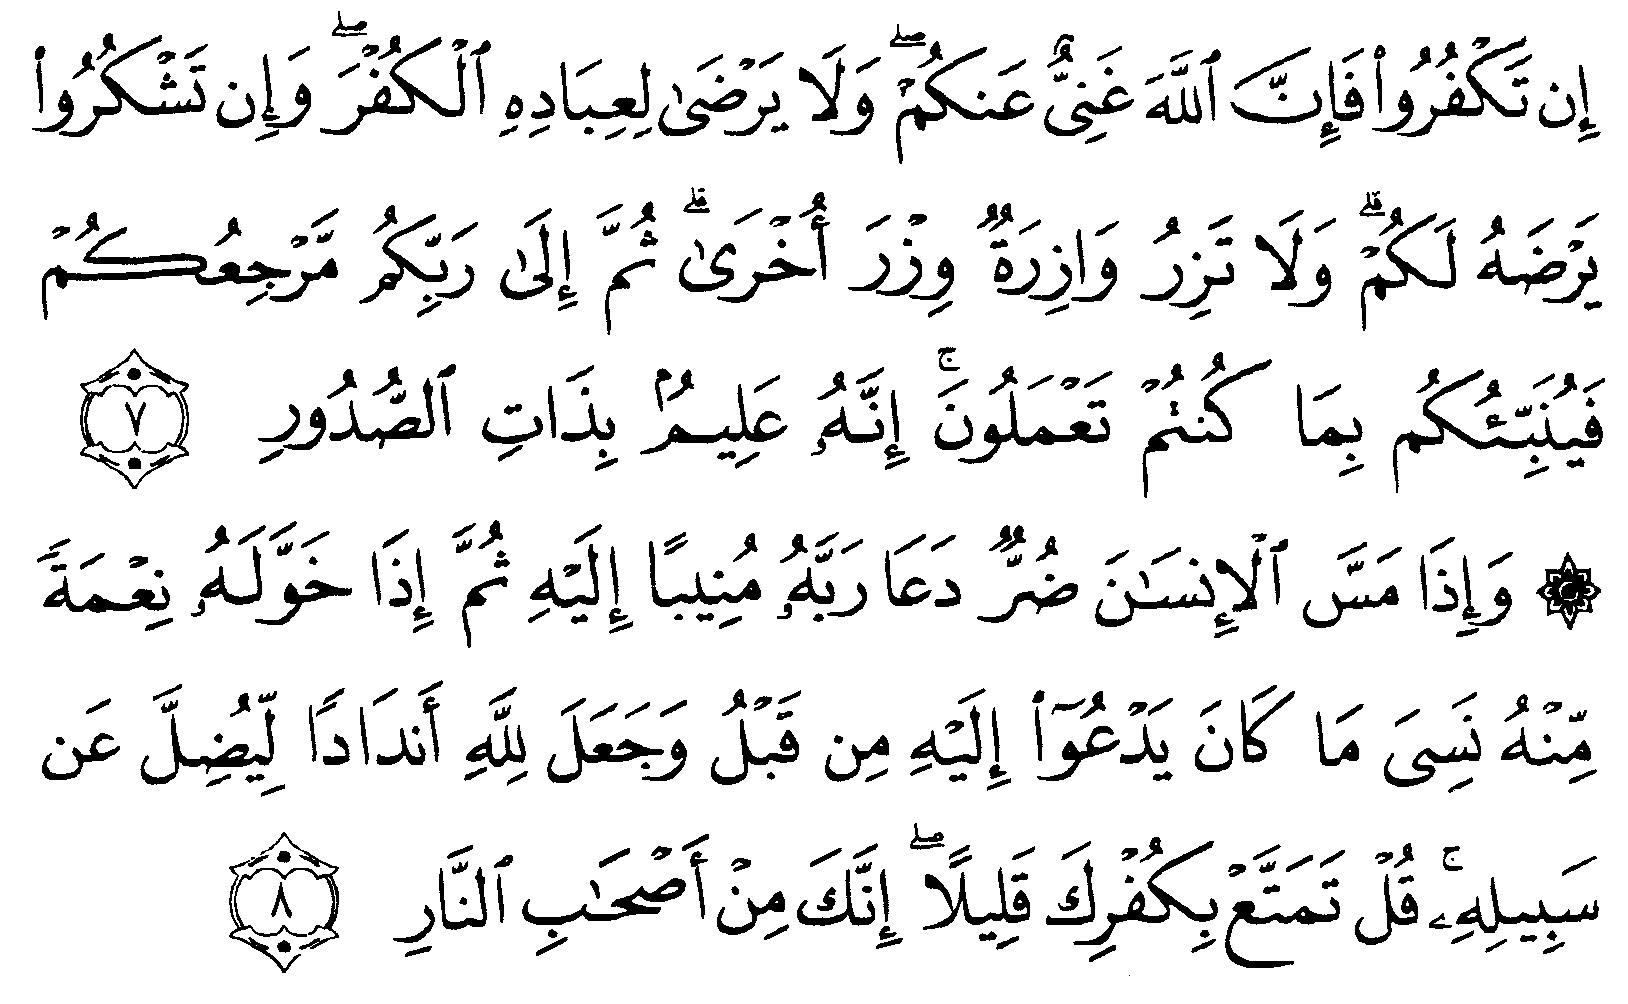 Tafsir Ibu Katsir Surah Az Zumar 3 Alquranmulia